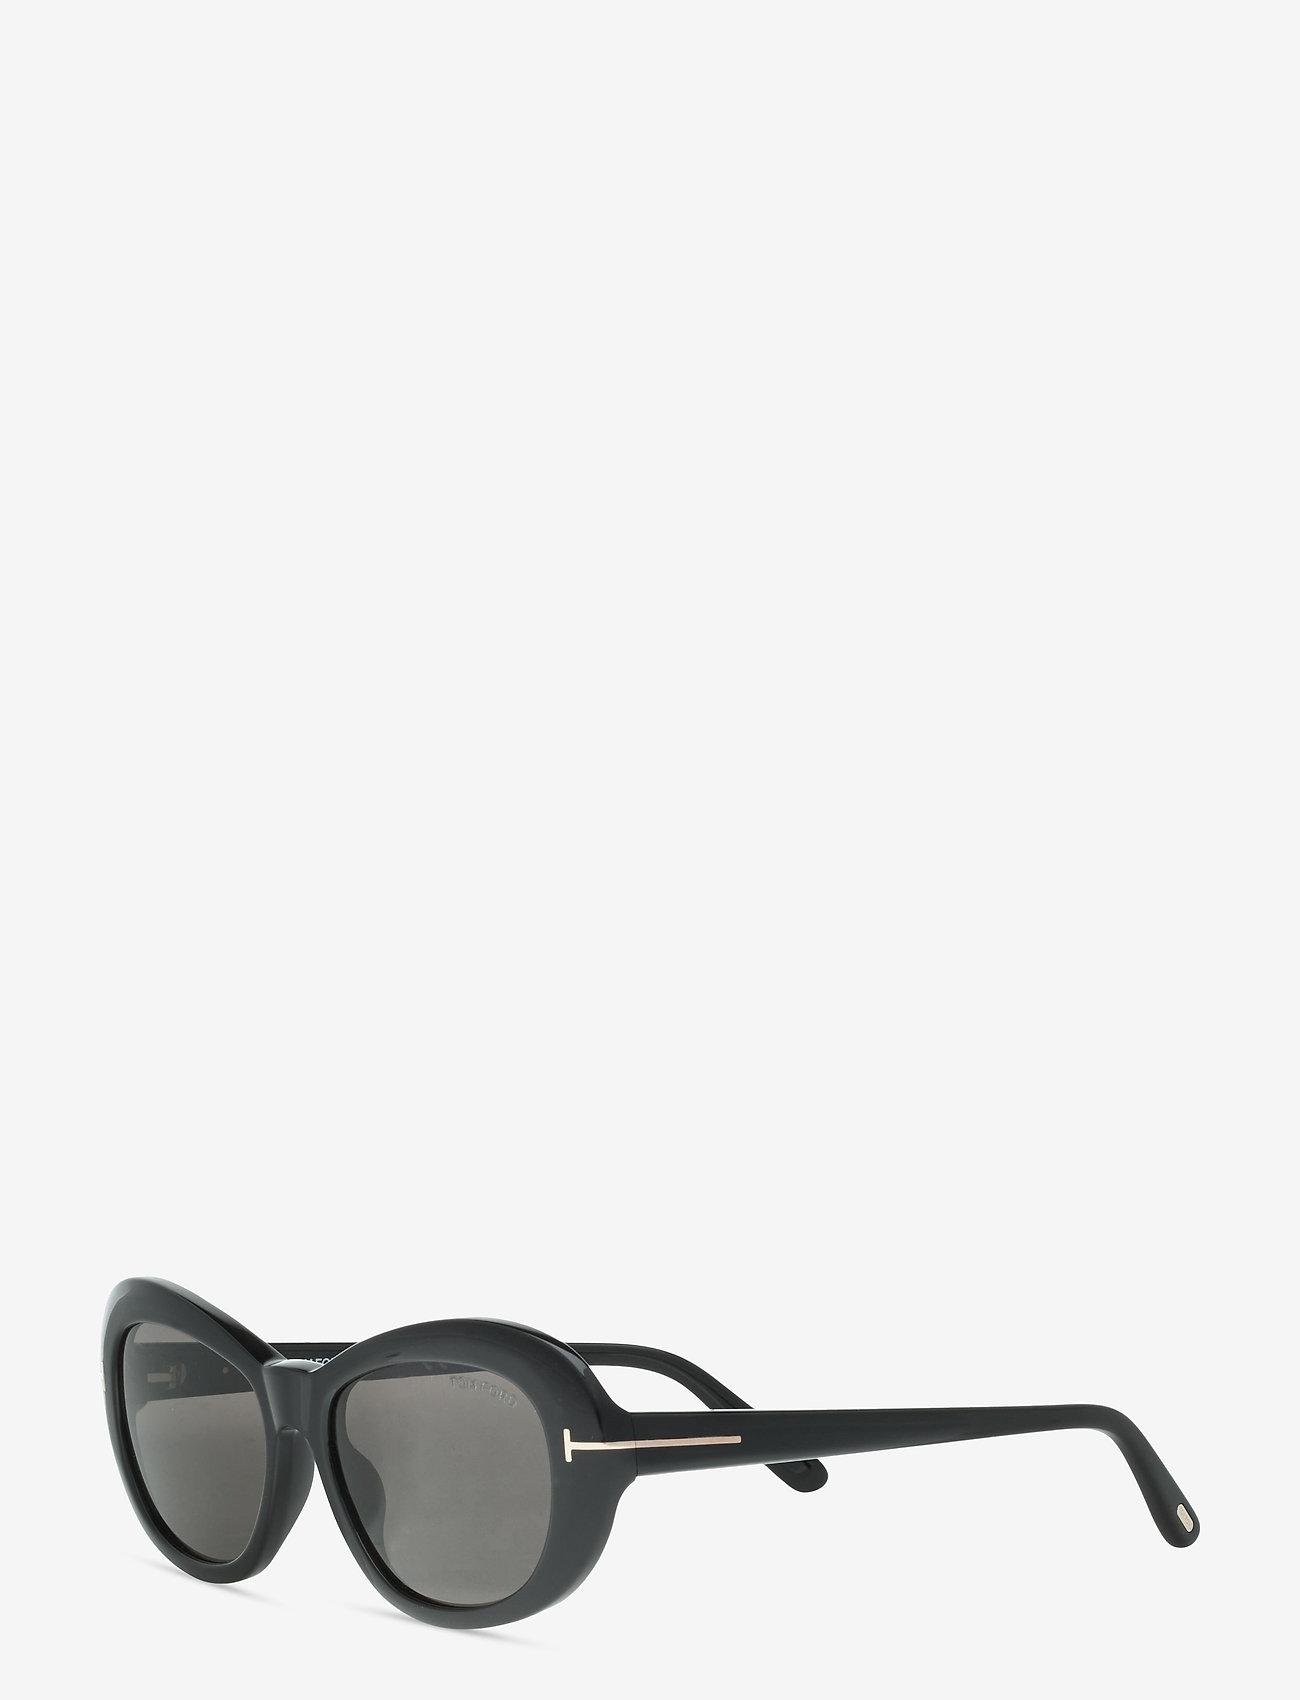 Tom Ford Sunglasses - ELODIE - rond model - shiny black - 1